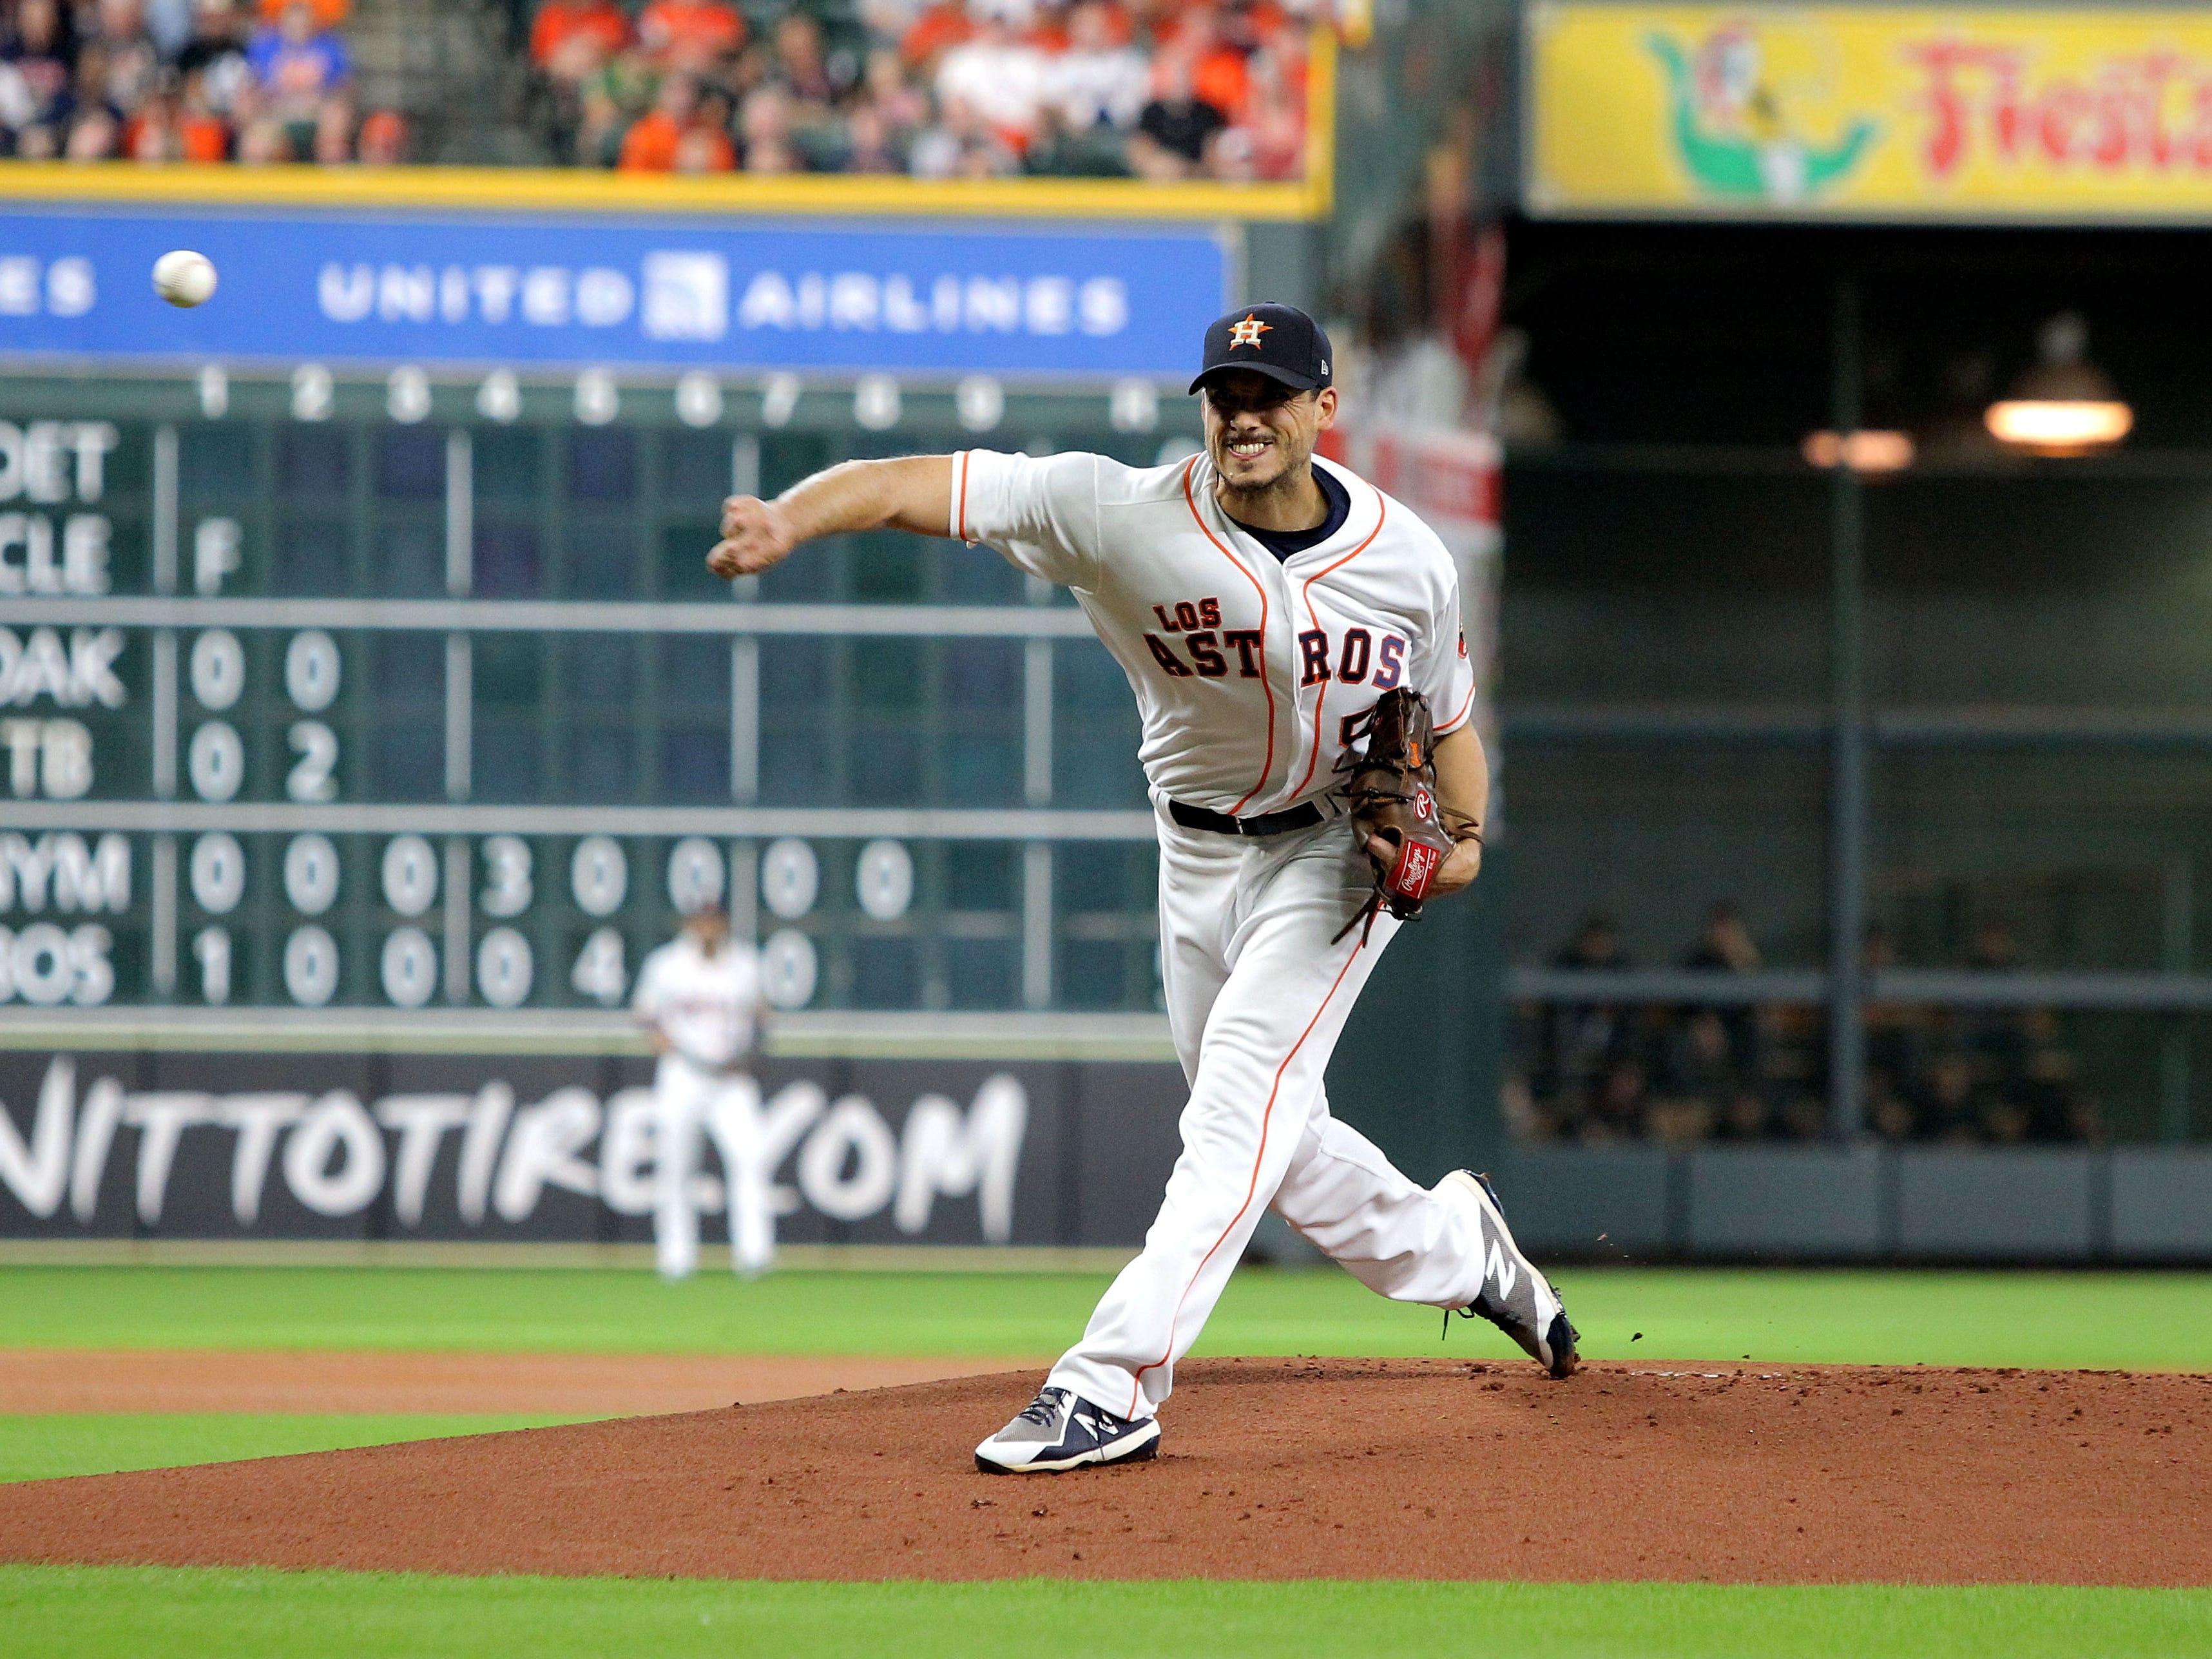 Sep 15, 2018; Houston, TX, USA; Houston Astros starting pitcher Charlie Morton (50) against the Arizona Diamondbacks during the first inning at Minute Maid Park. Mandatory Credit: Erik Williams-USA TODAY Sports